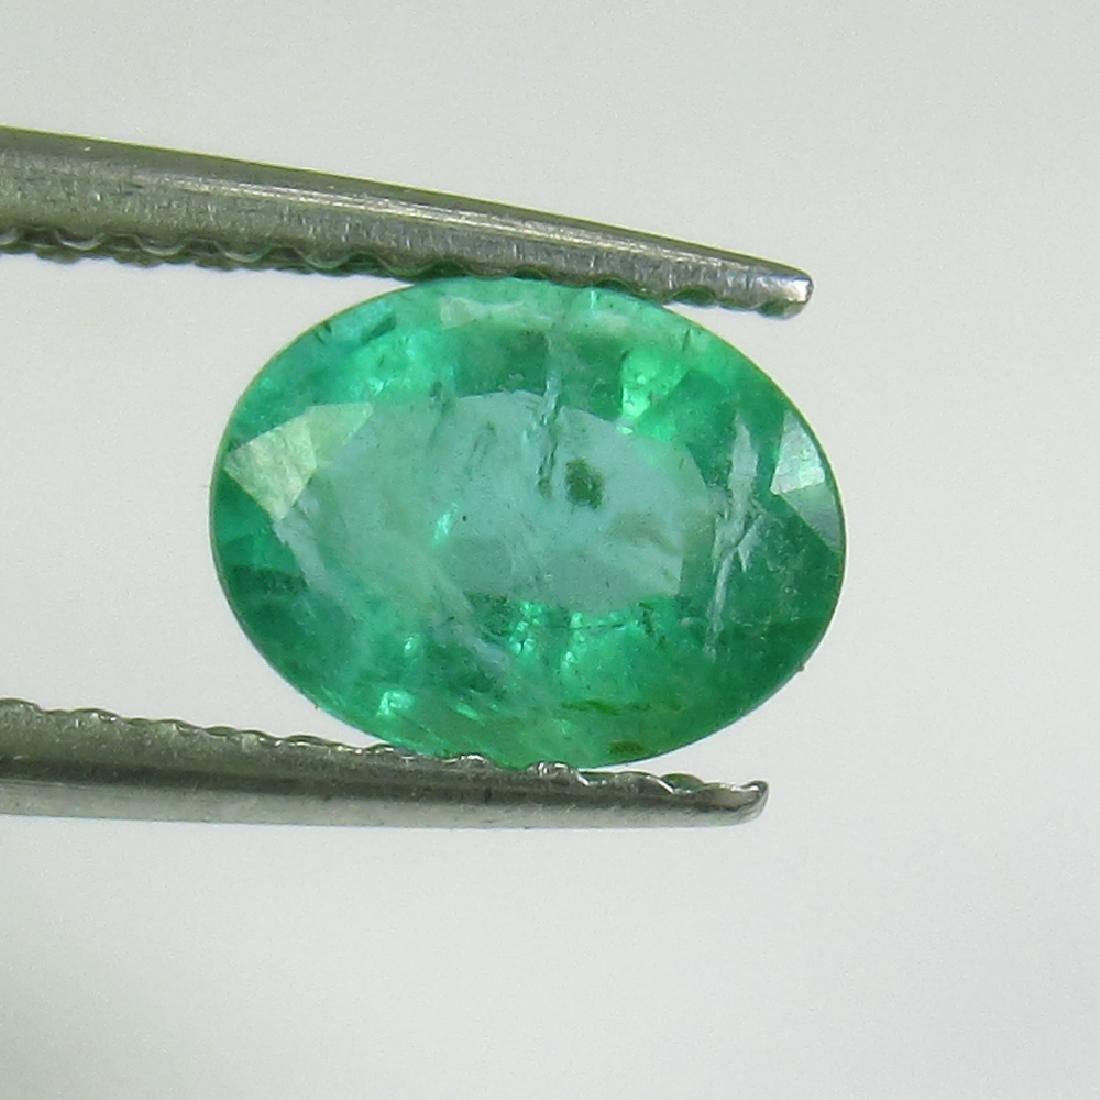 0.70 Ct Genuine Zambian Emerald 6.5X5 mm Oval Cut